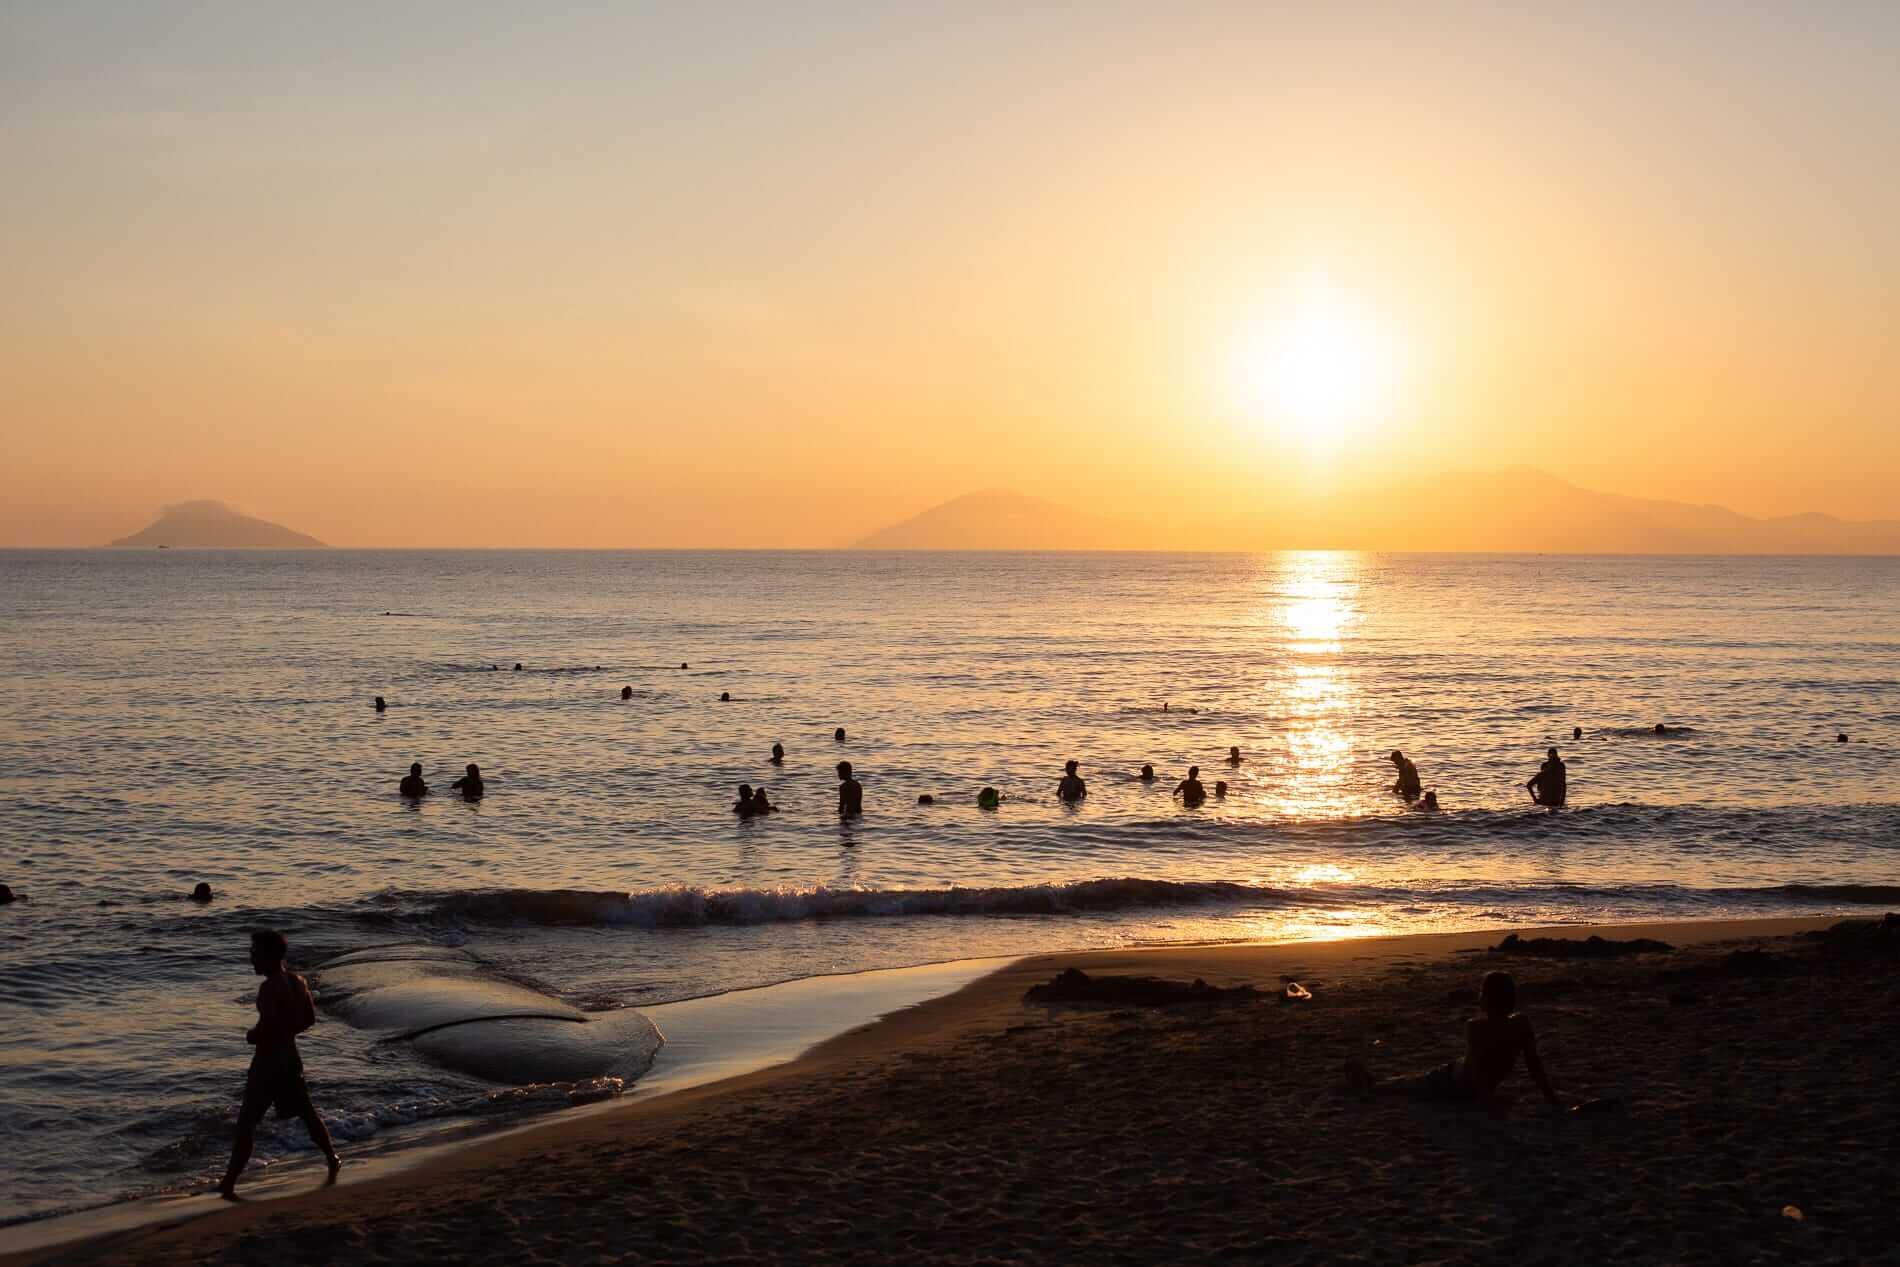 Sun rises behind the Cham Islands